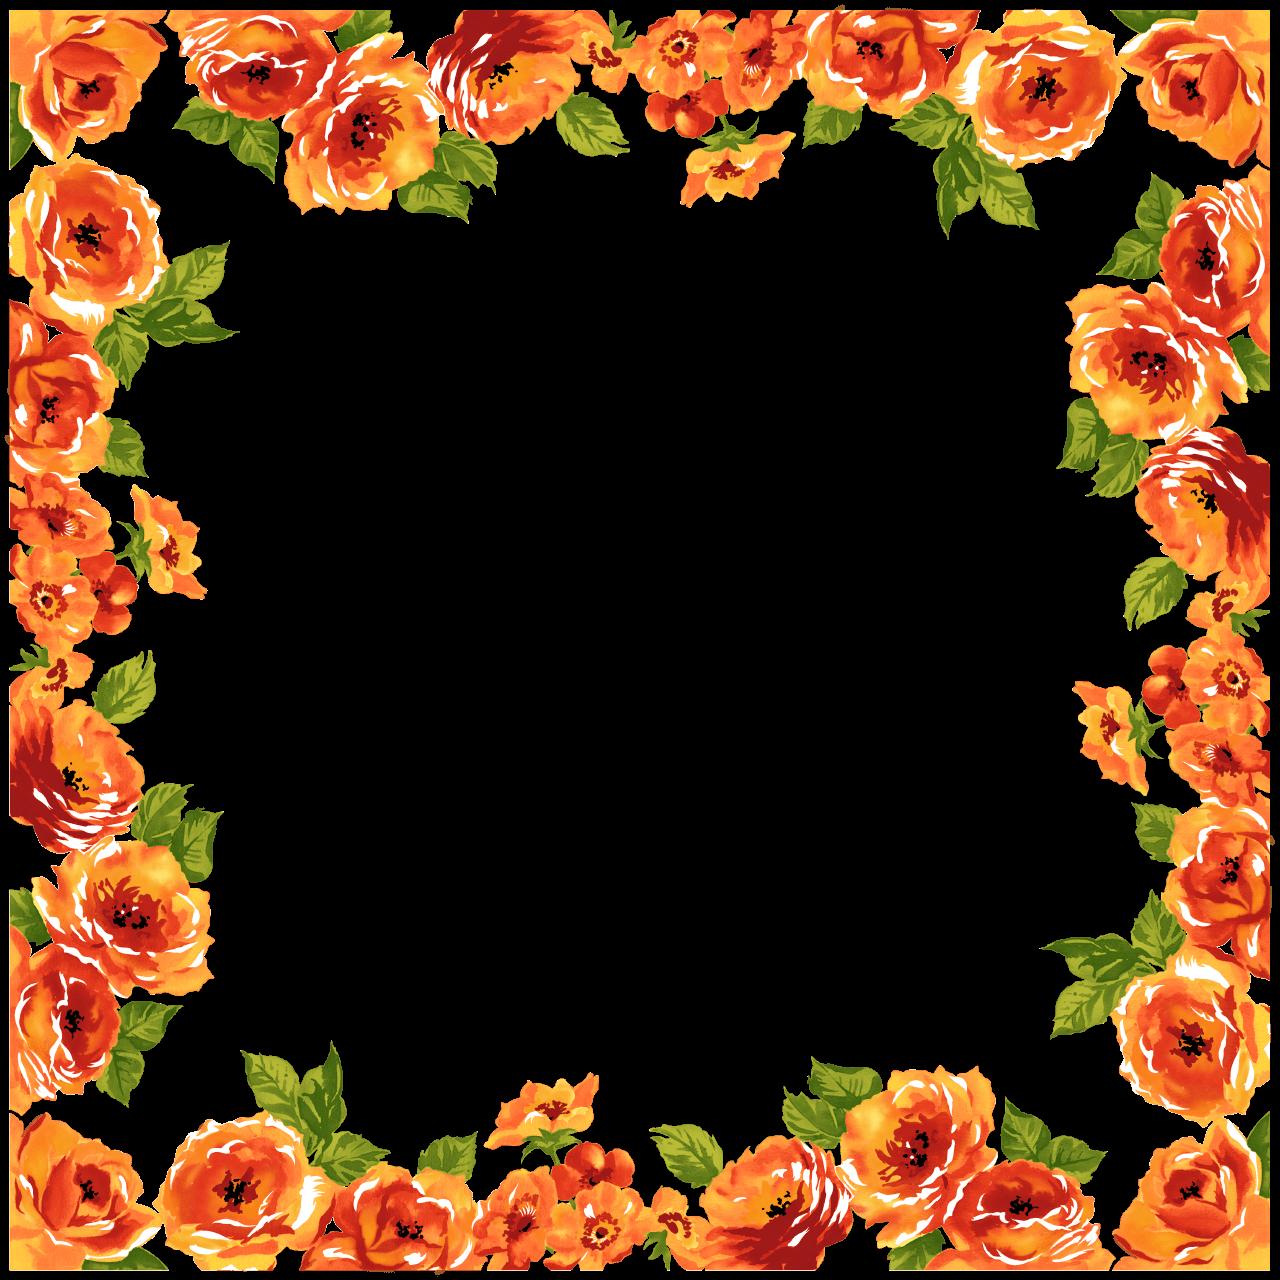 deco frame flowers transparent png stickpng